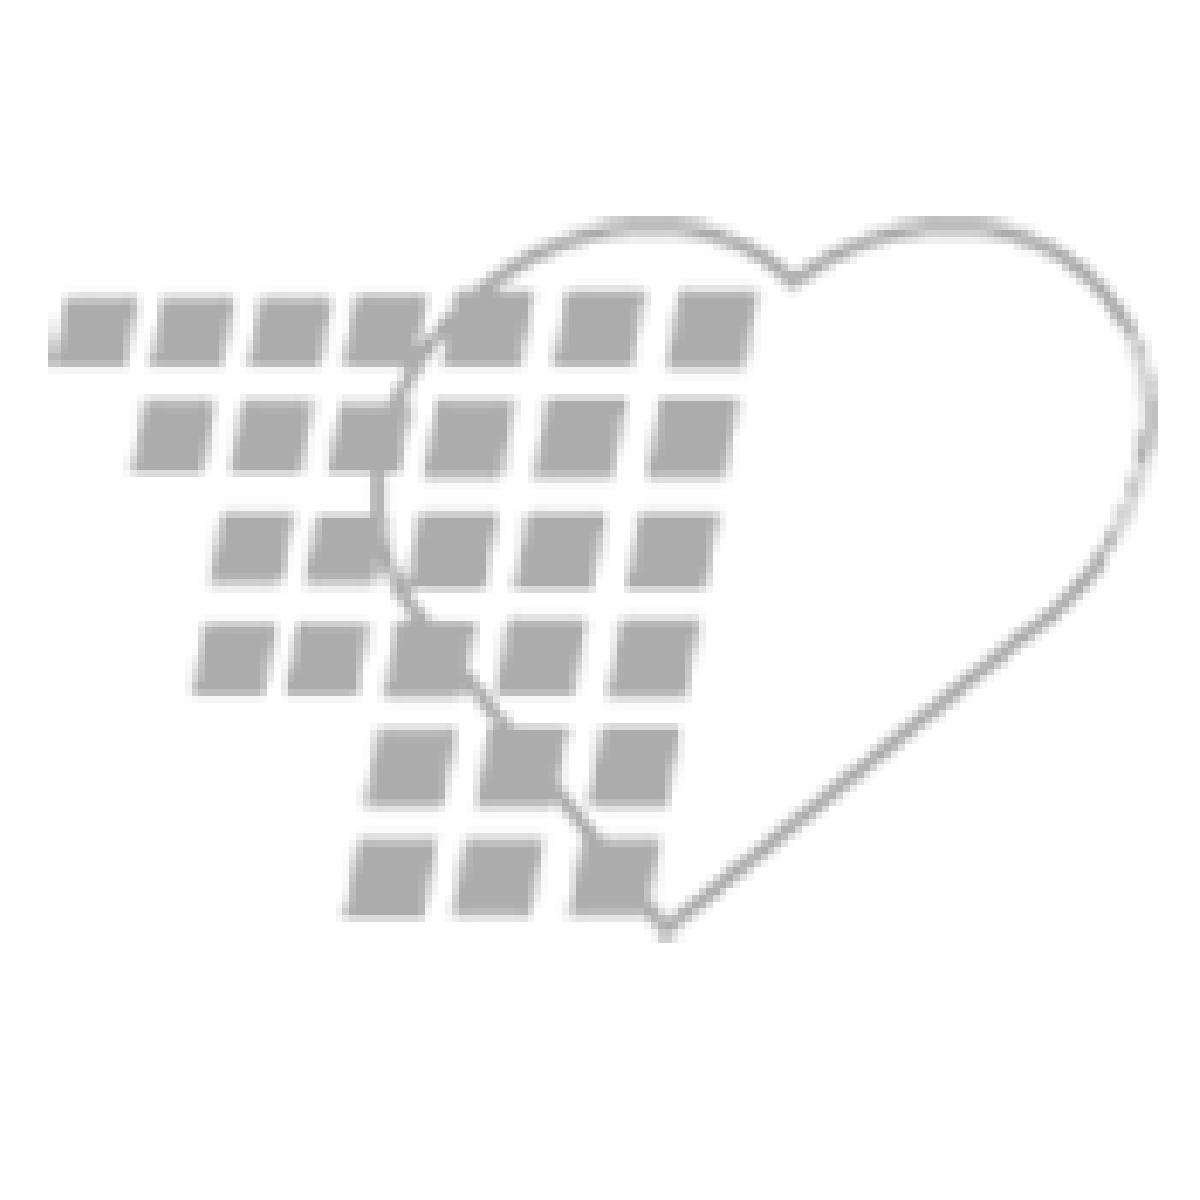 09-31-3004 PEDI Slide Chart© Measuring Tapes